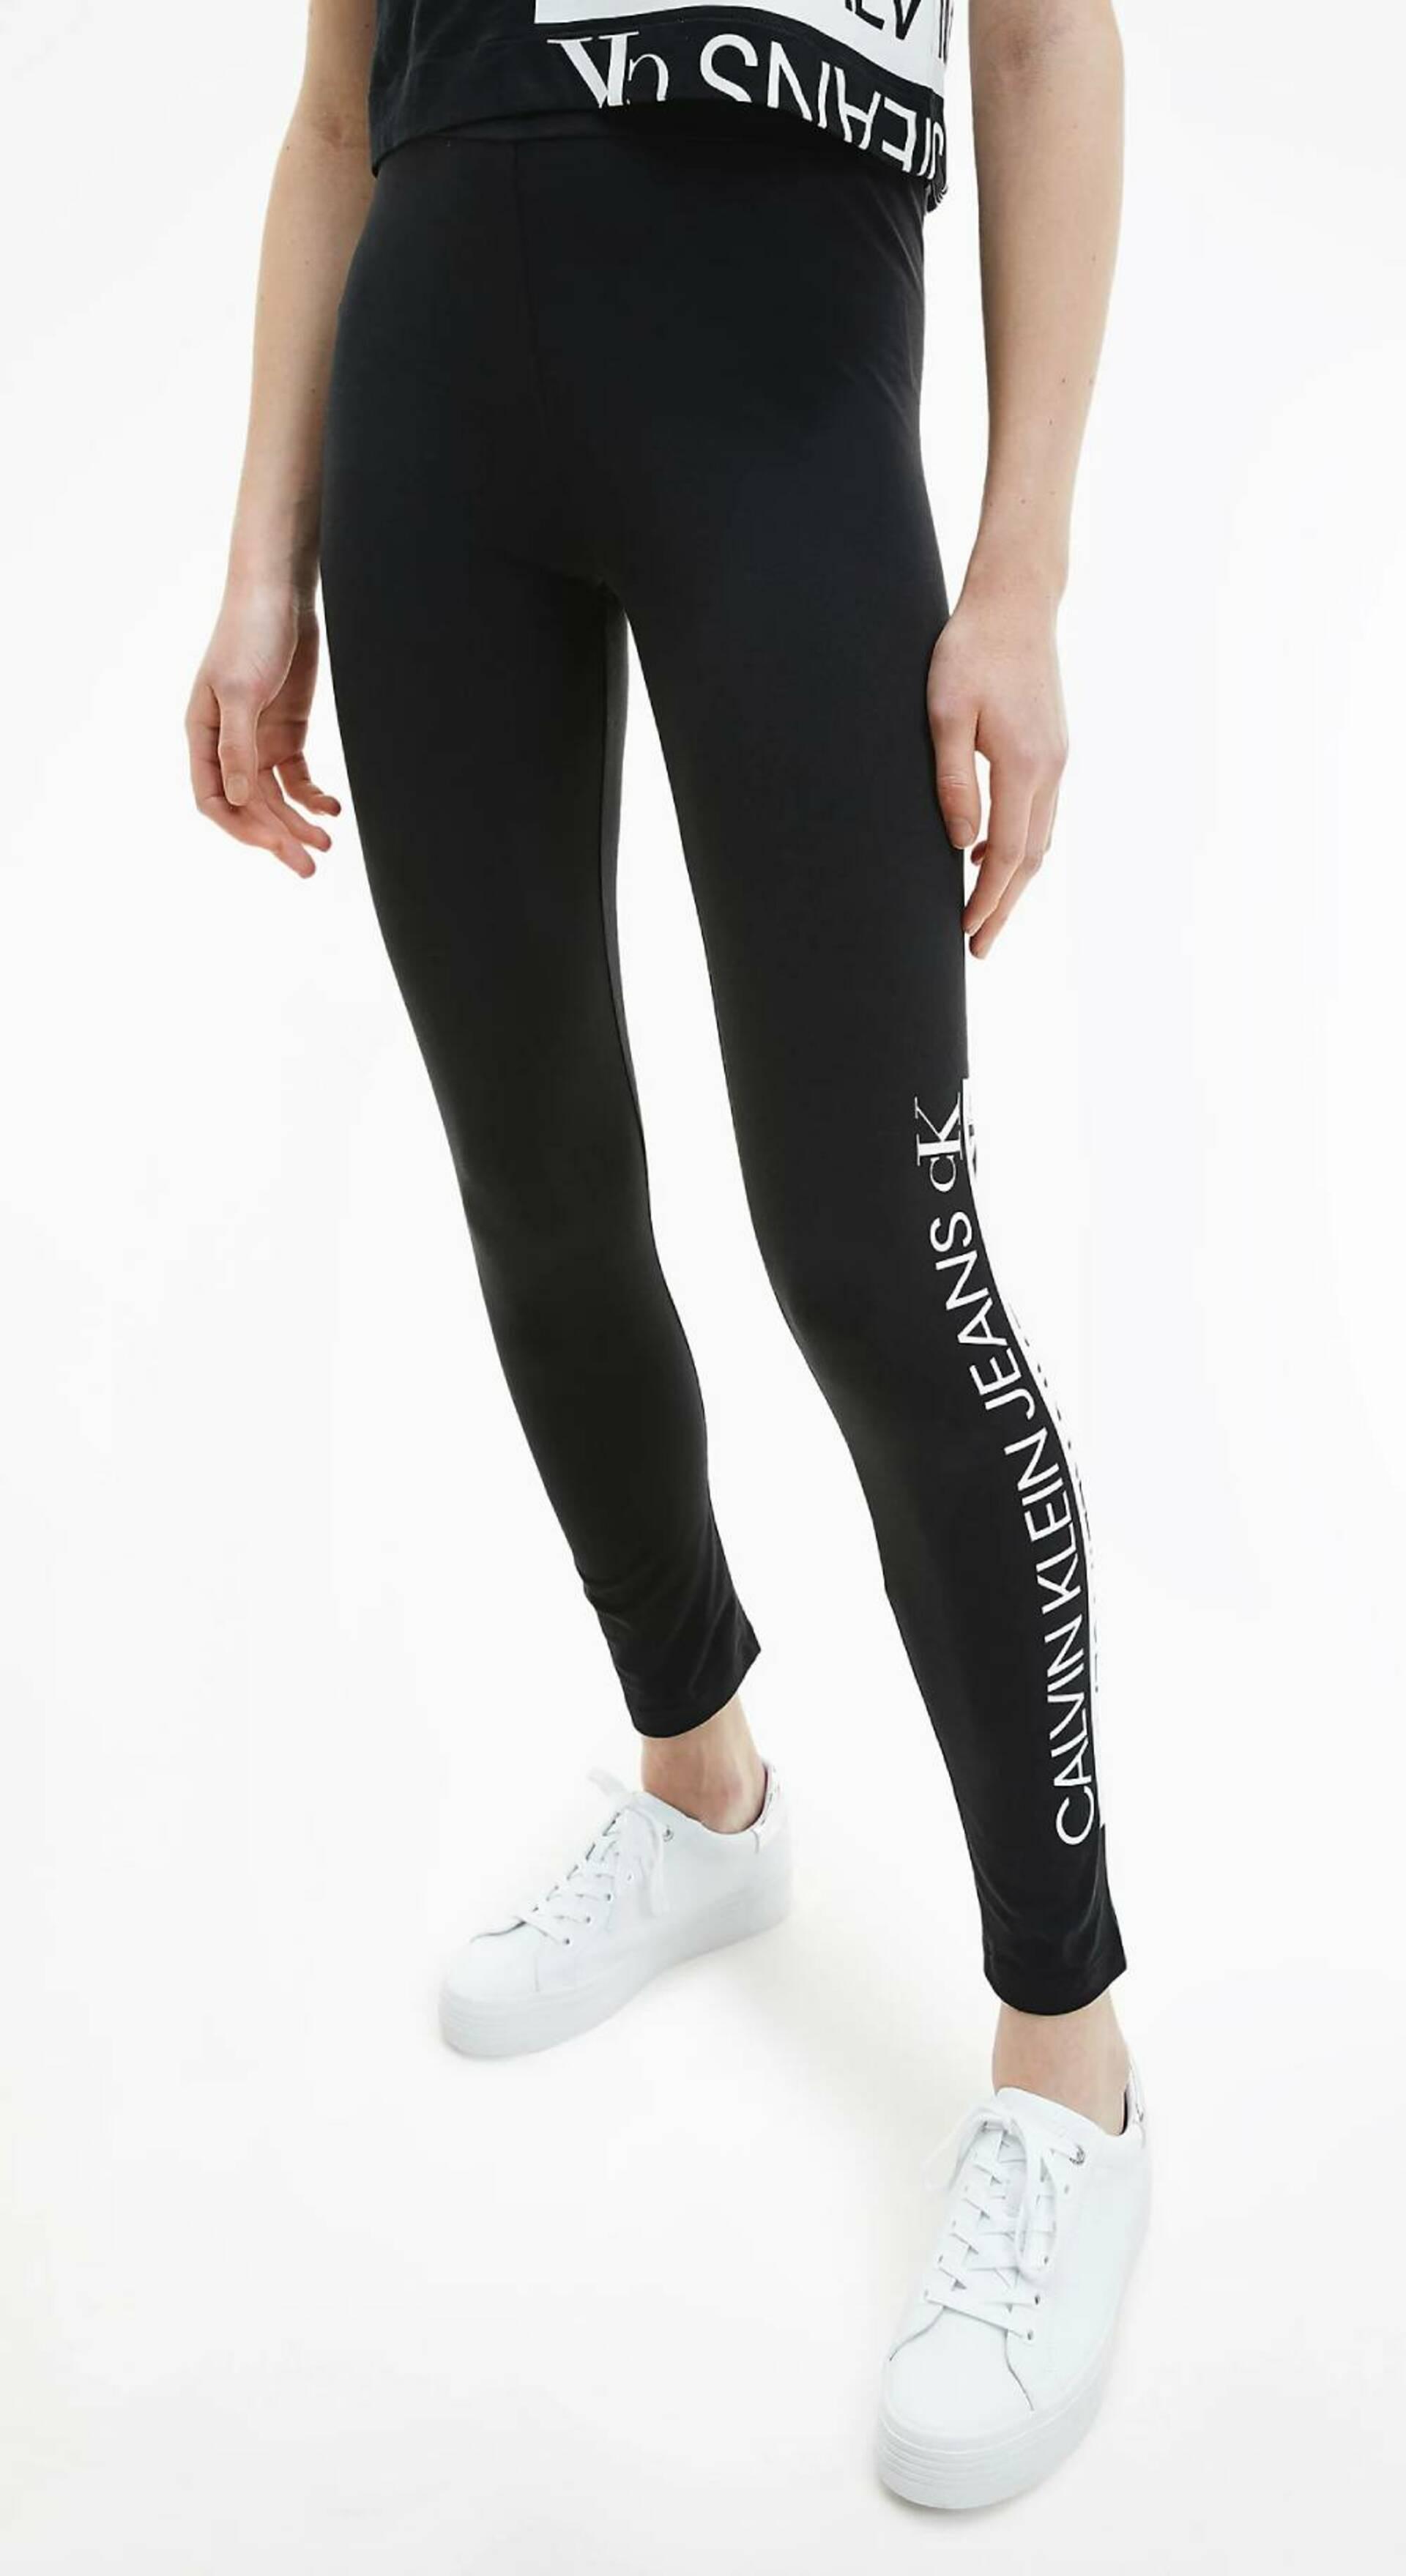 Calvin Klein dámské černé legíny - S (BEH)